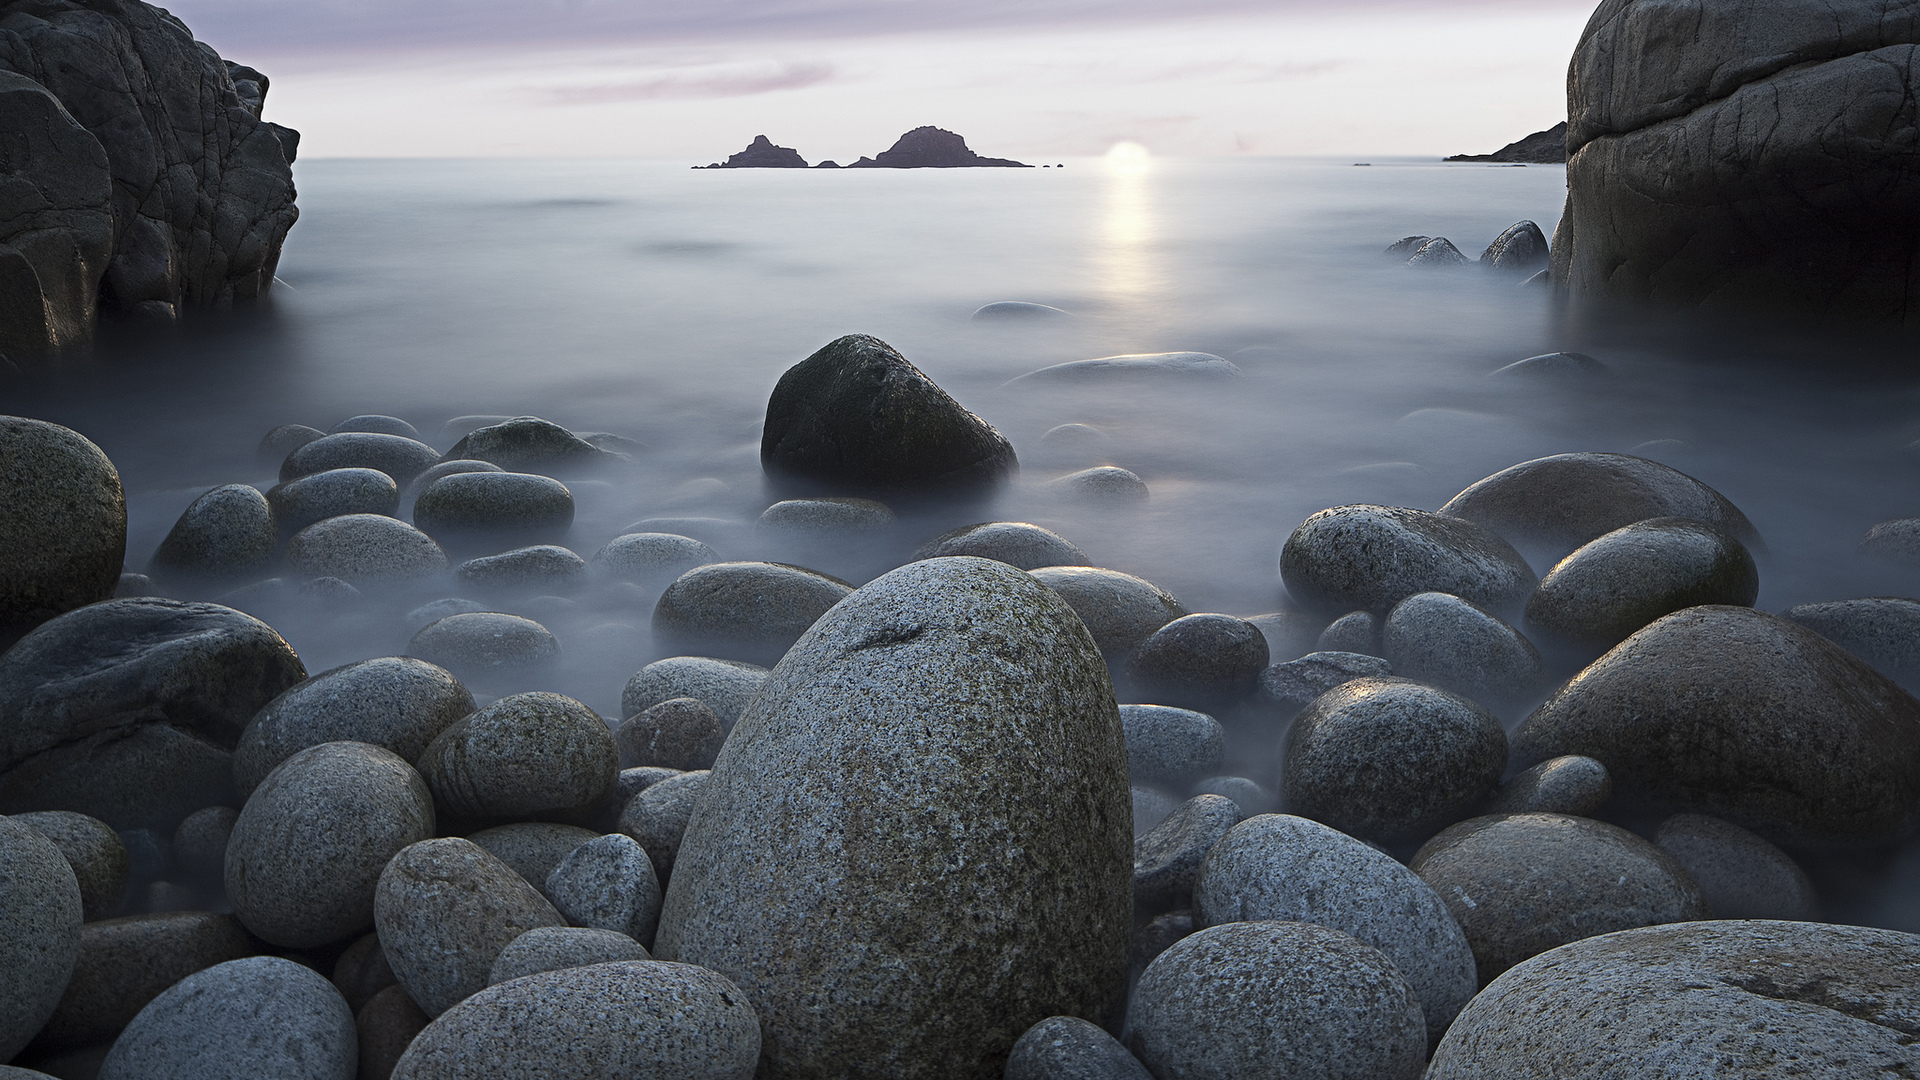 1920x1080 Rocks Stones Sea Sky Nature Laptop Full HD 1080P ...